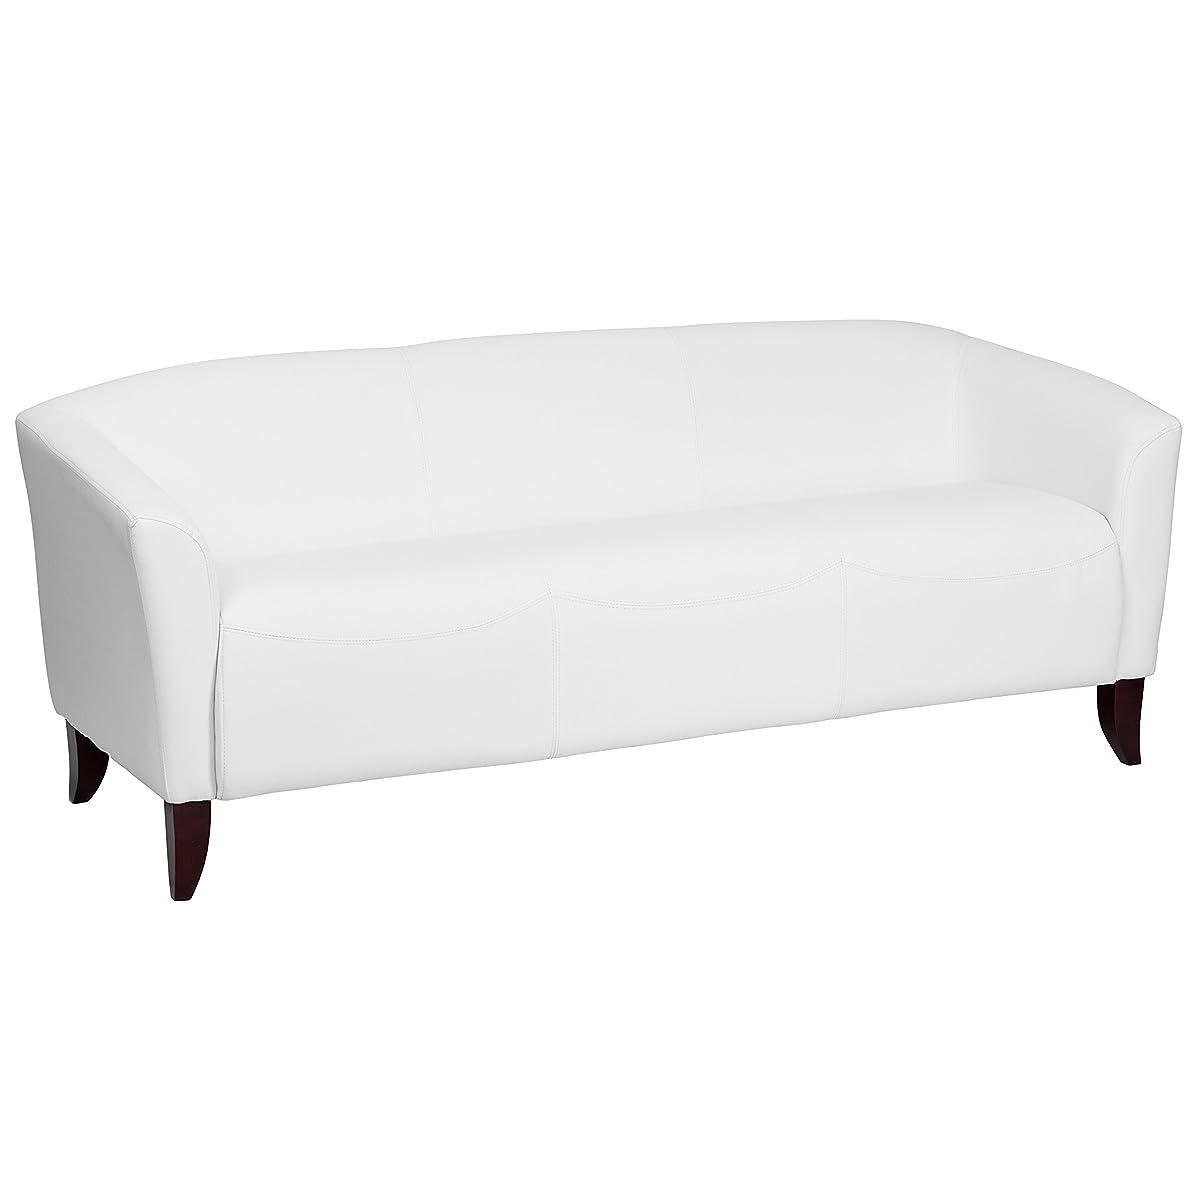 Flash Furniture HERCULES Imperial Series White Leather Sofa